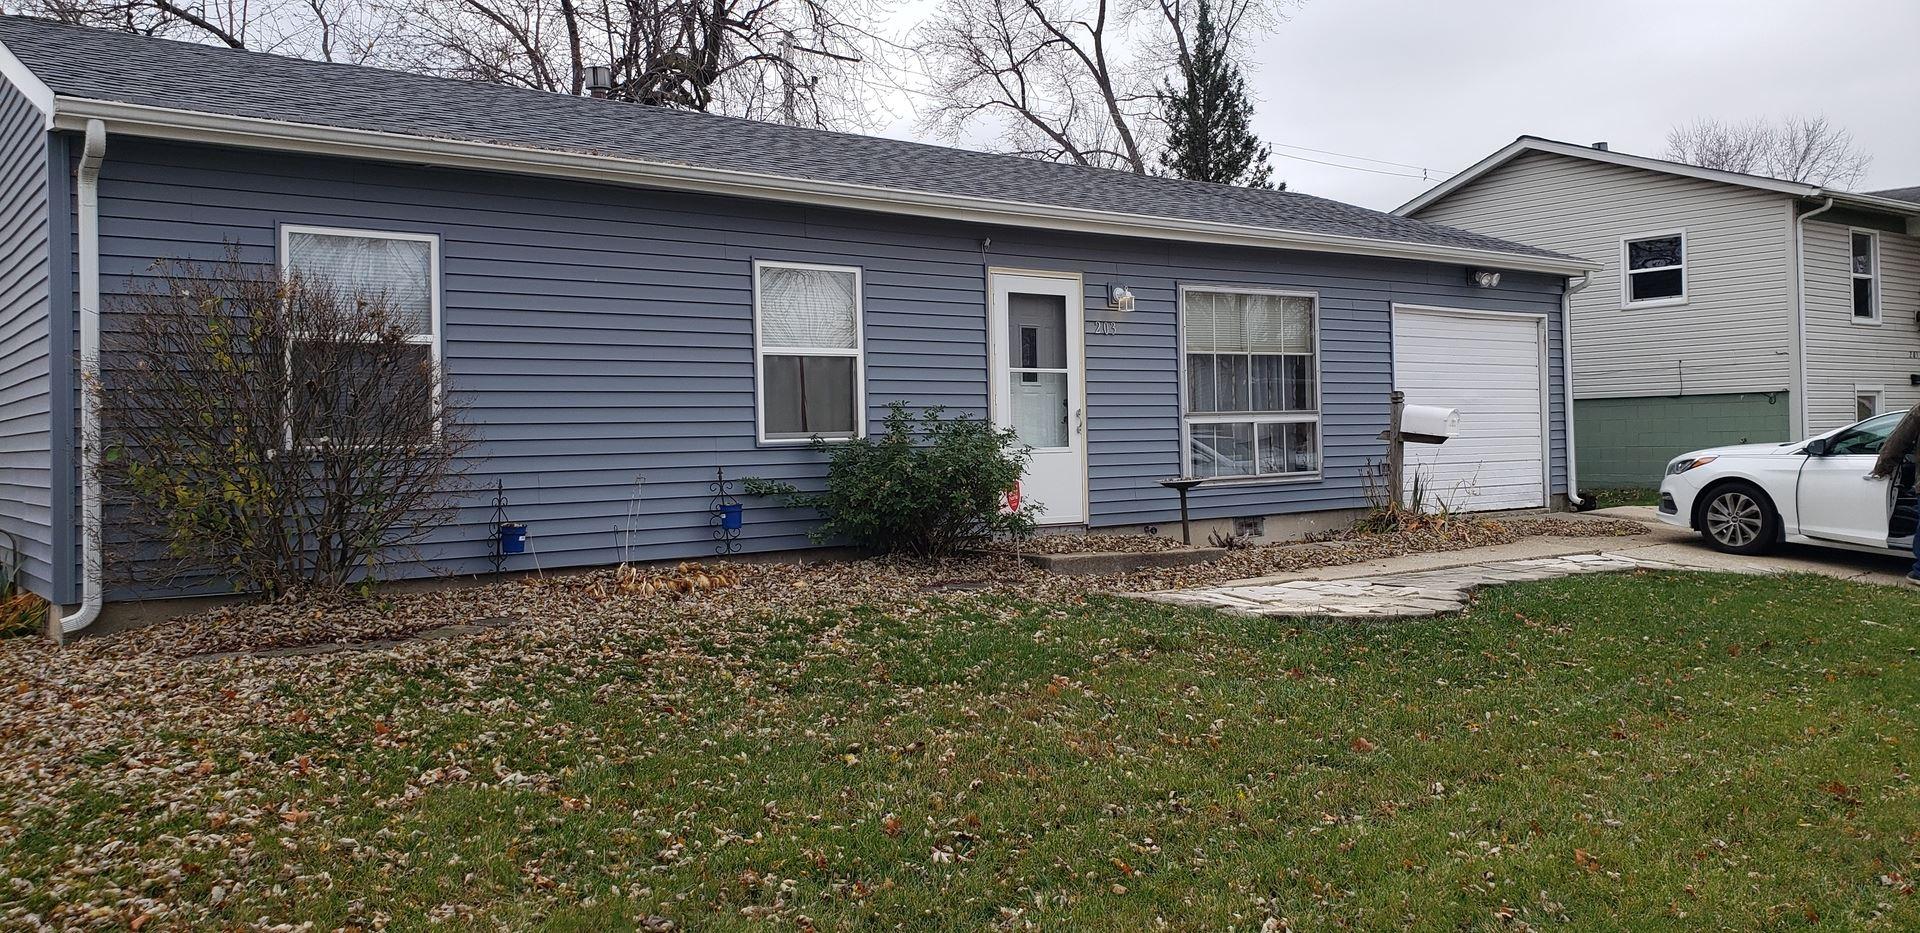 Photo of 203 Haller Avenue, Romeoville, IL 60446 (MLS # 10931604)